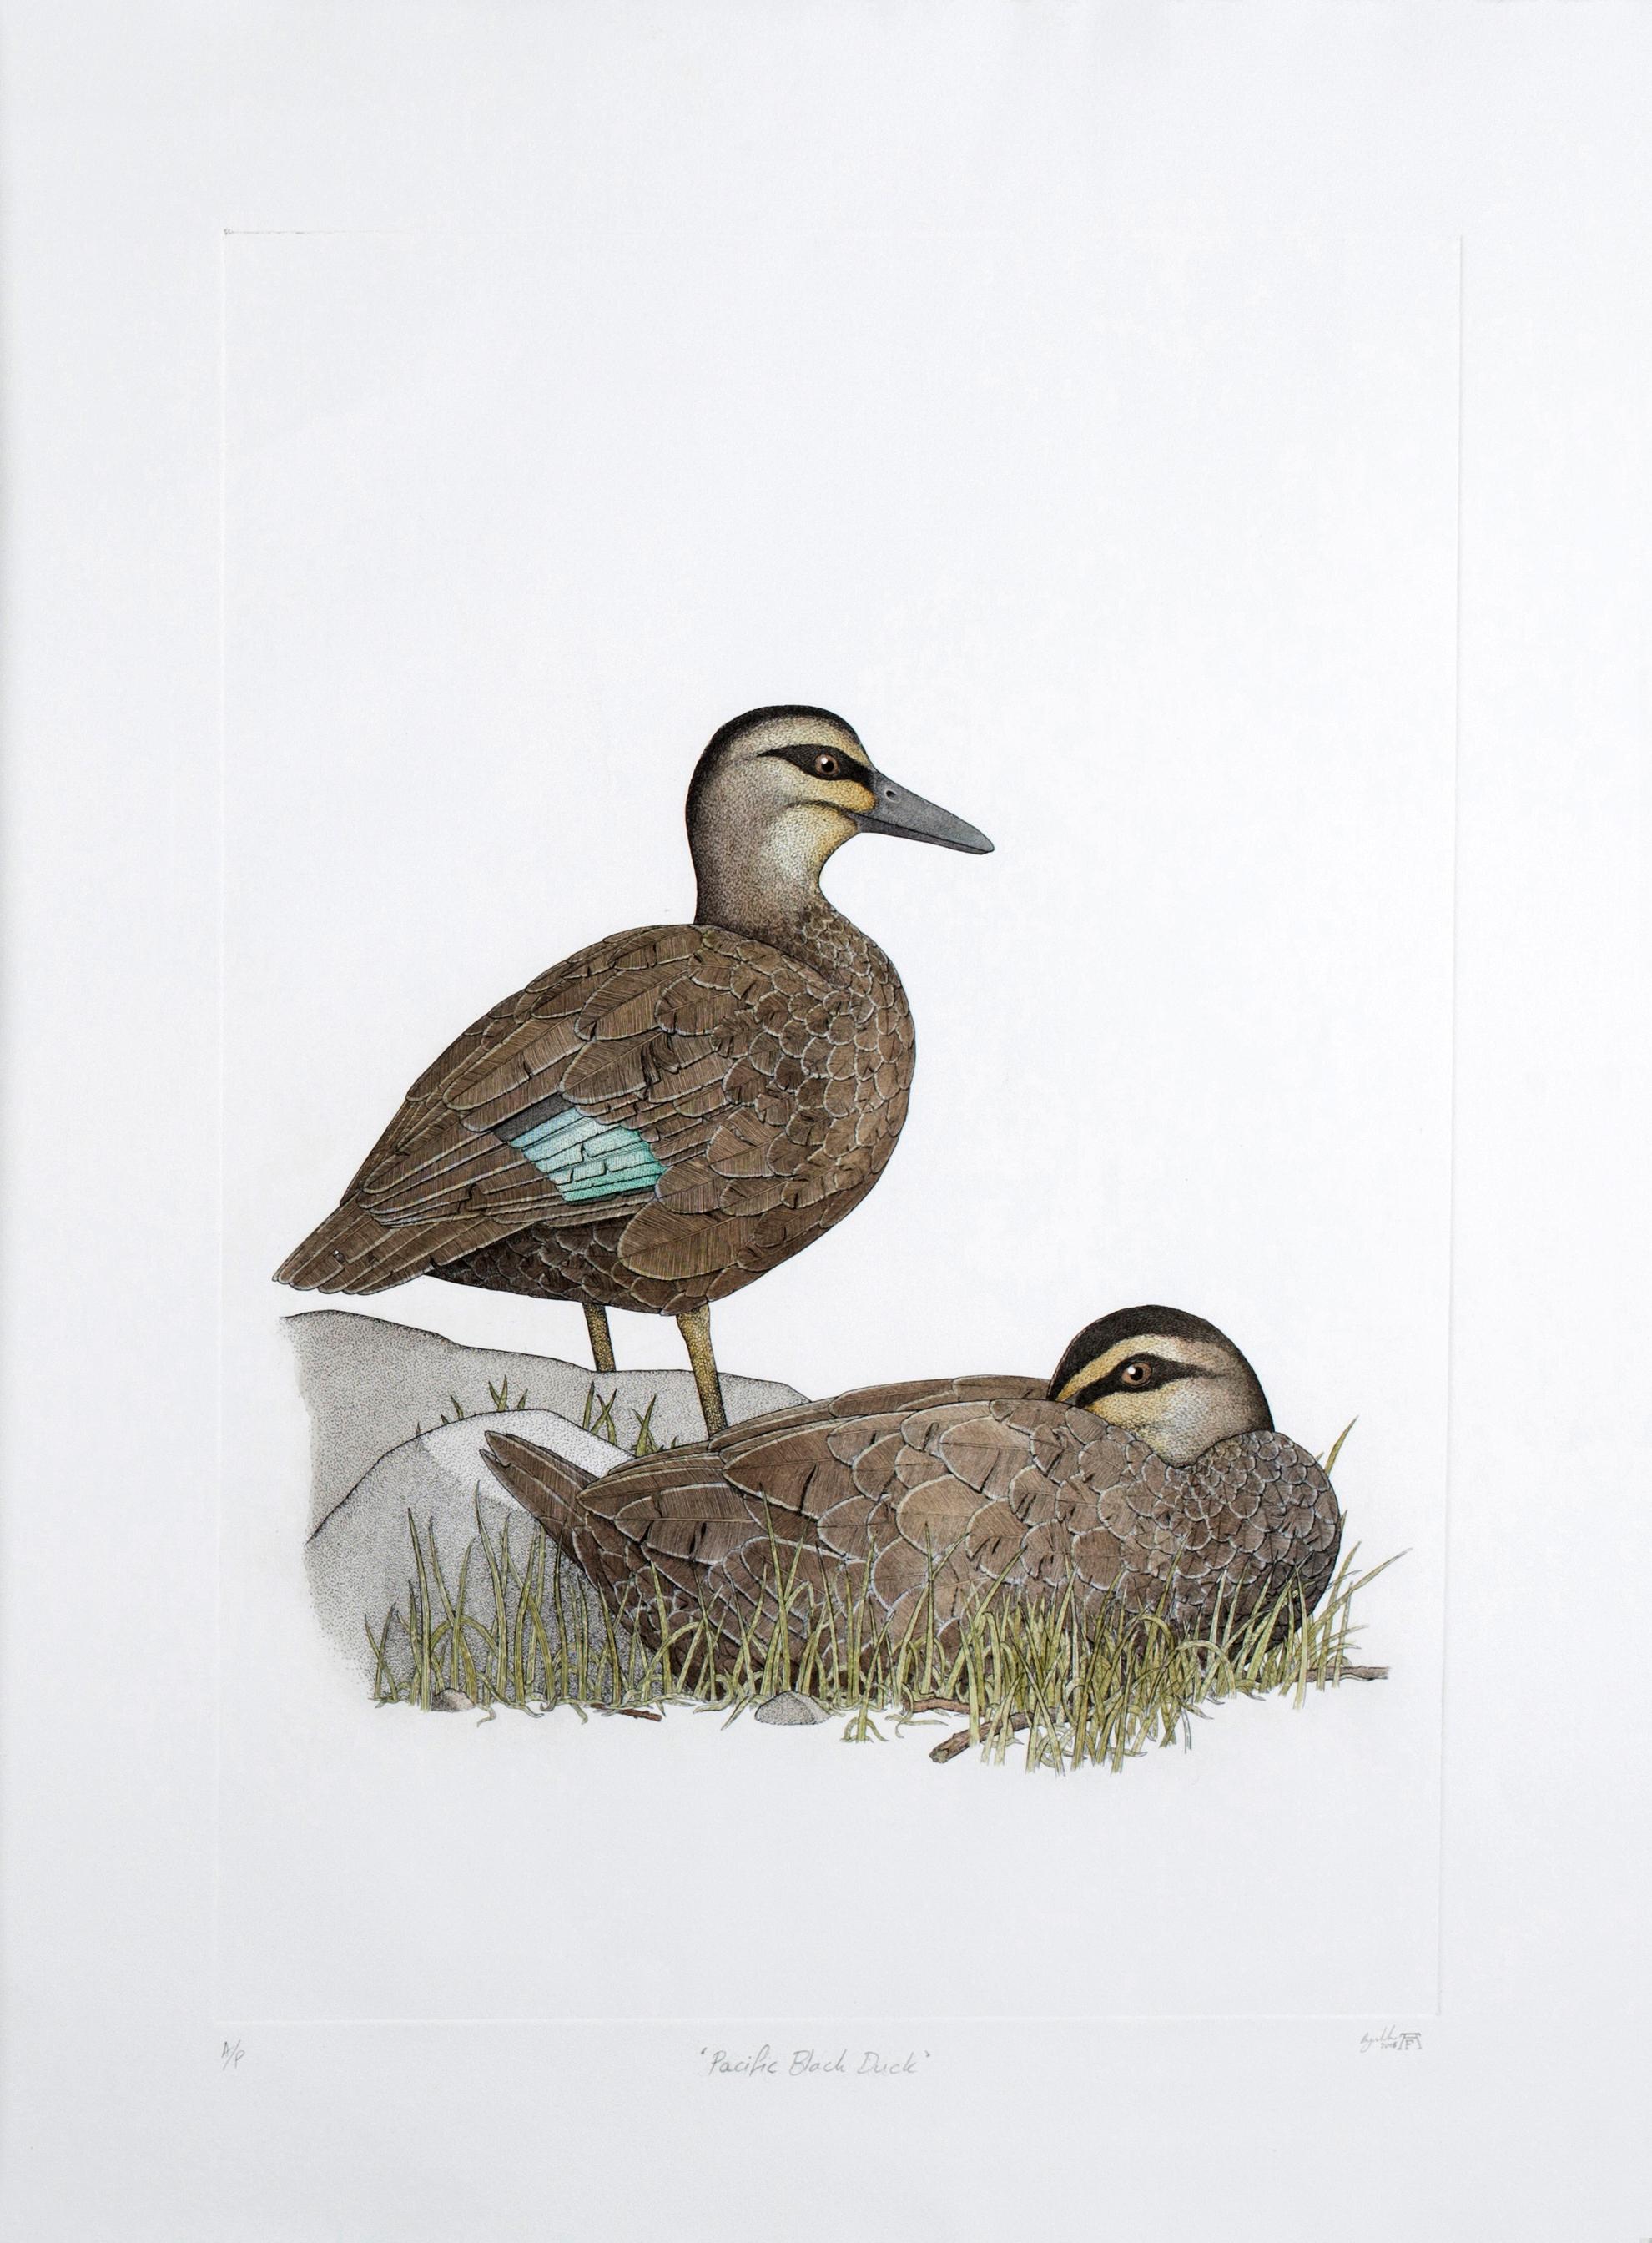 'Pacific Black Duck'